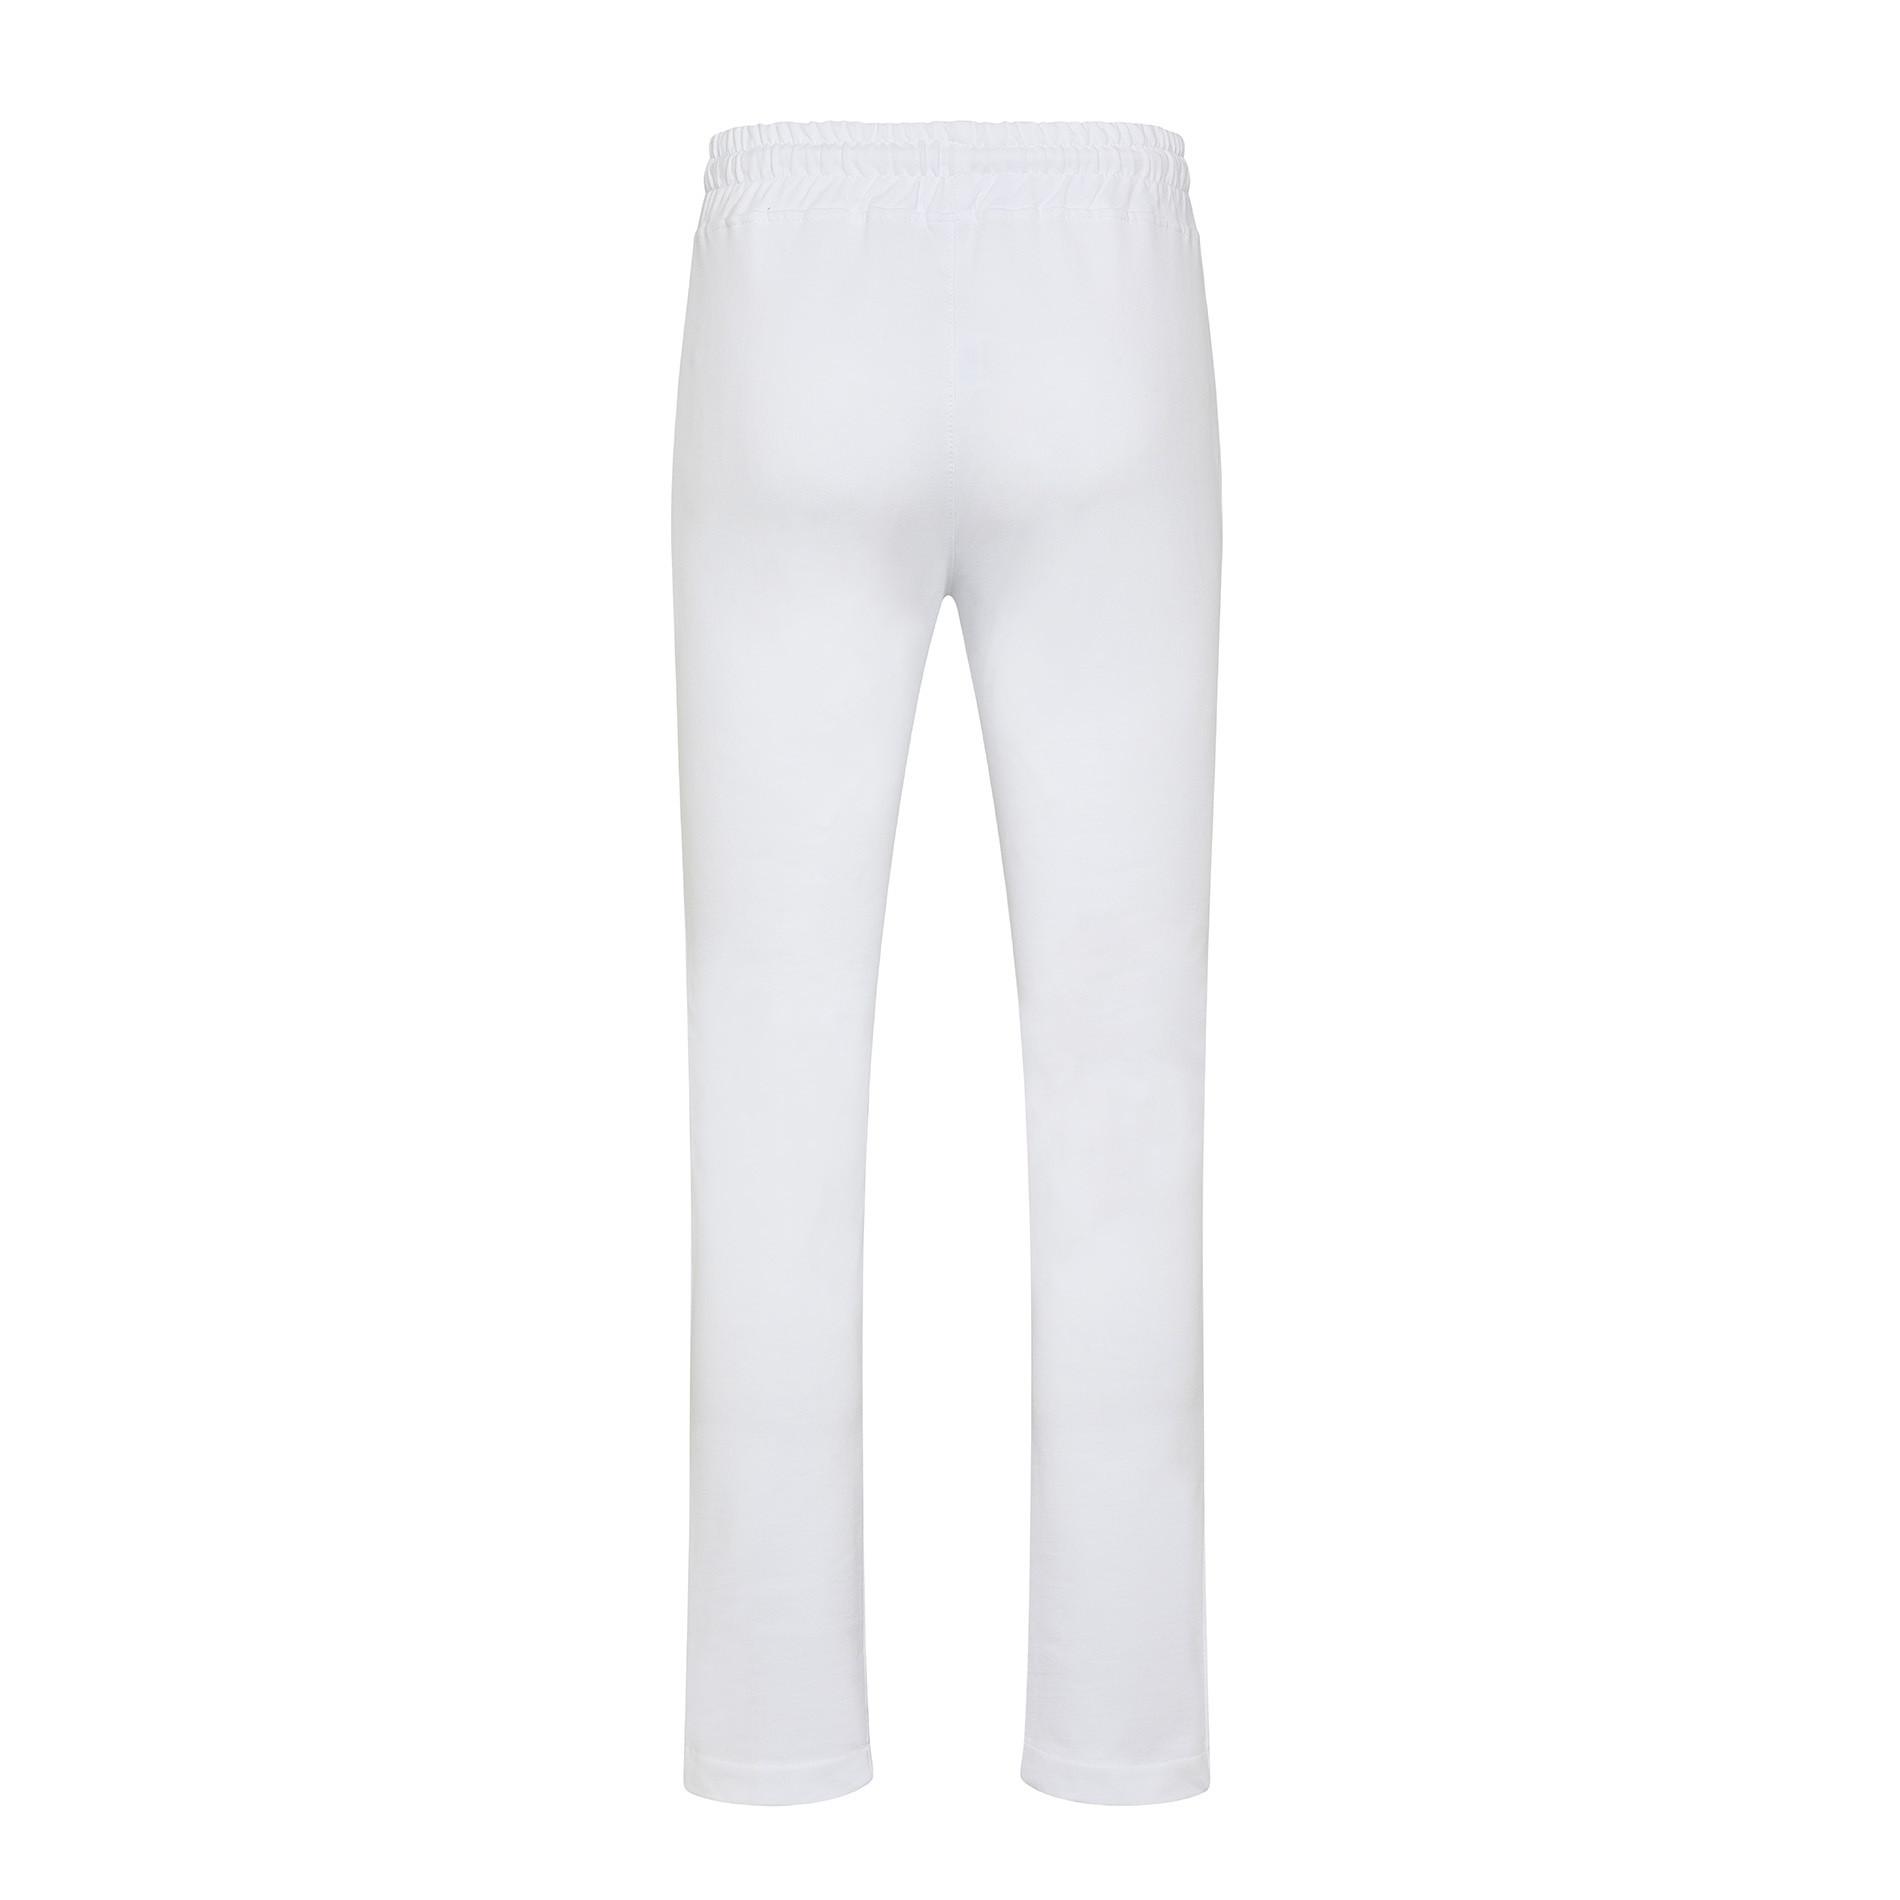 Pantalone felpa di cotone JCT, Bianco, large image number 1